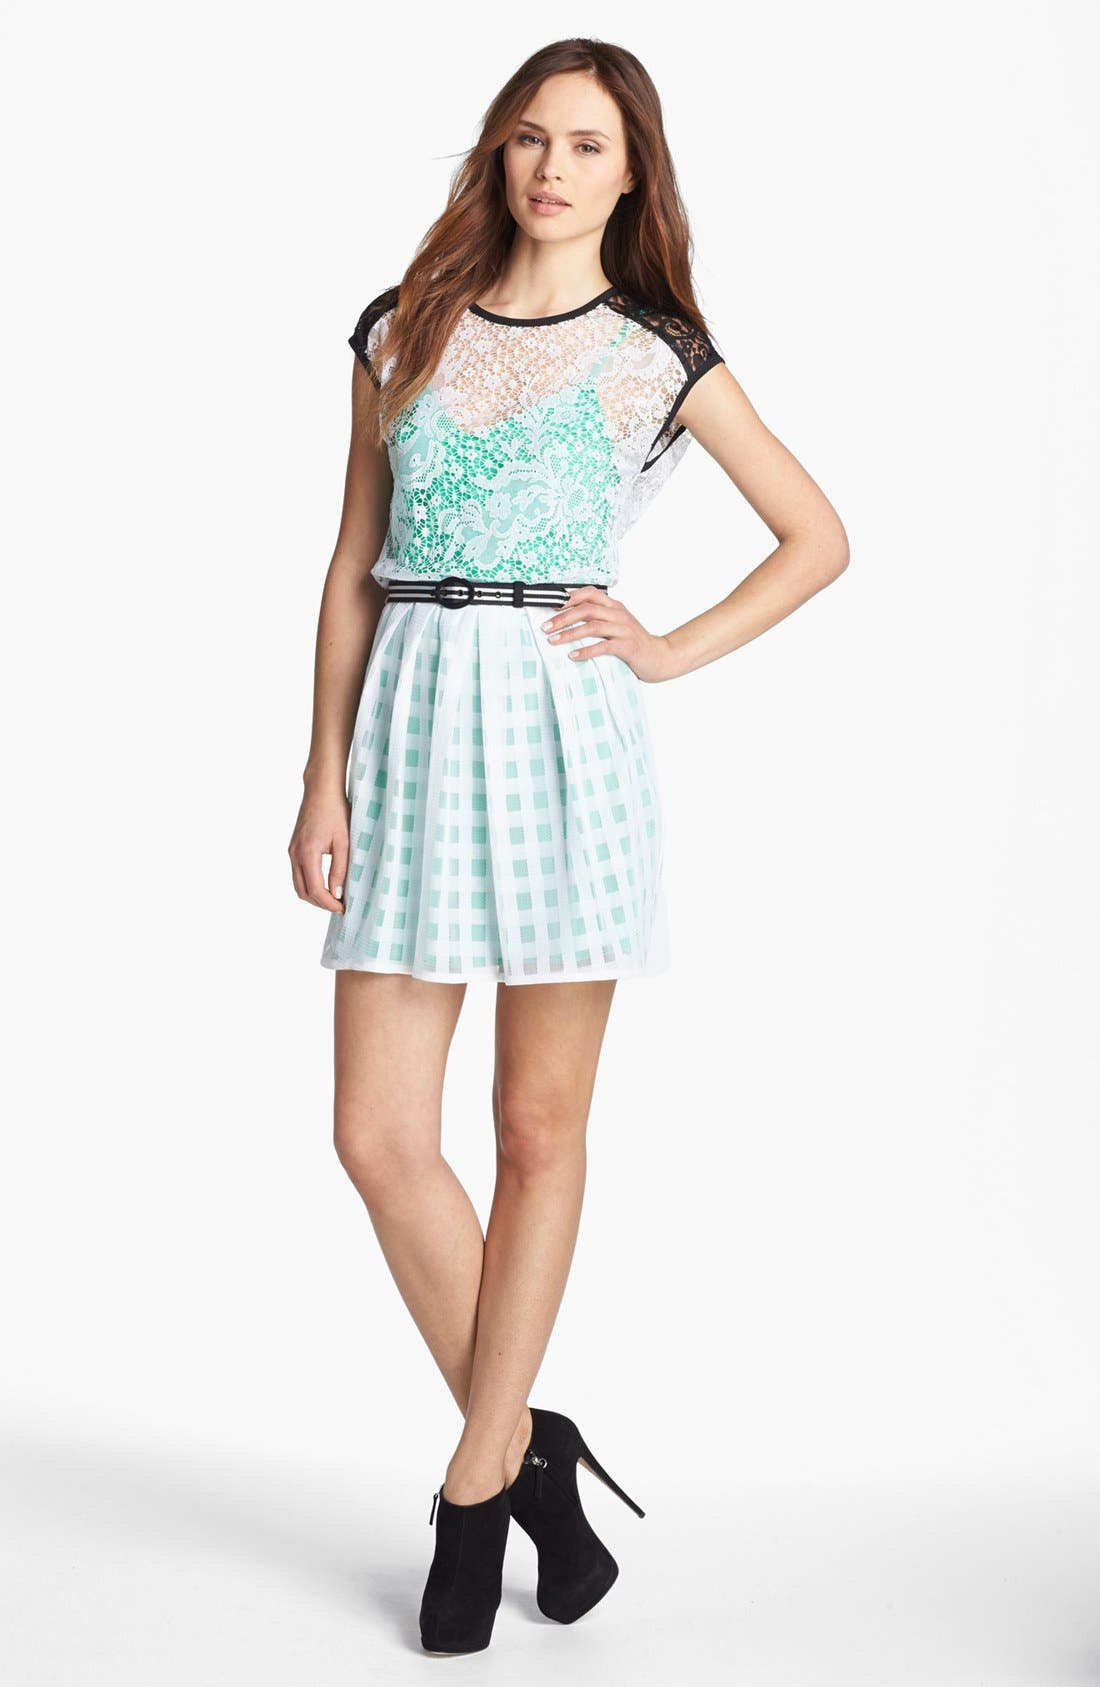 Alternate Image 1 Selected - Nanette Lepore 'Just Dance' Lace Blouson Dress